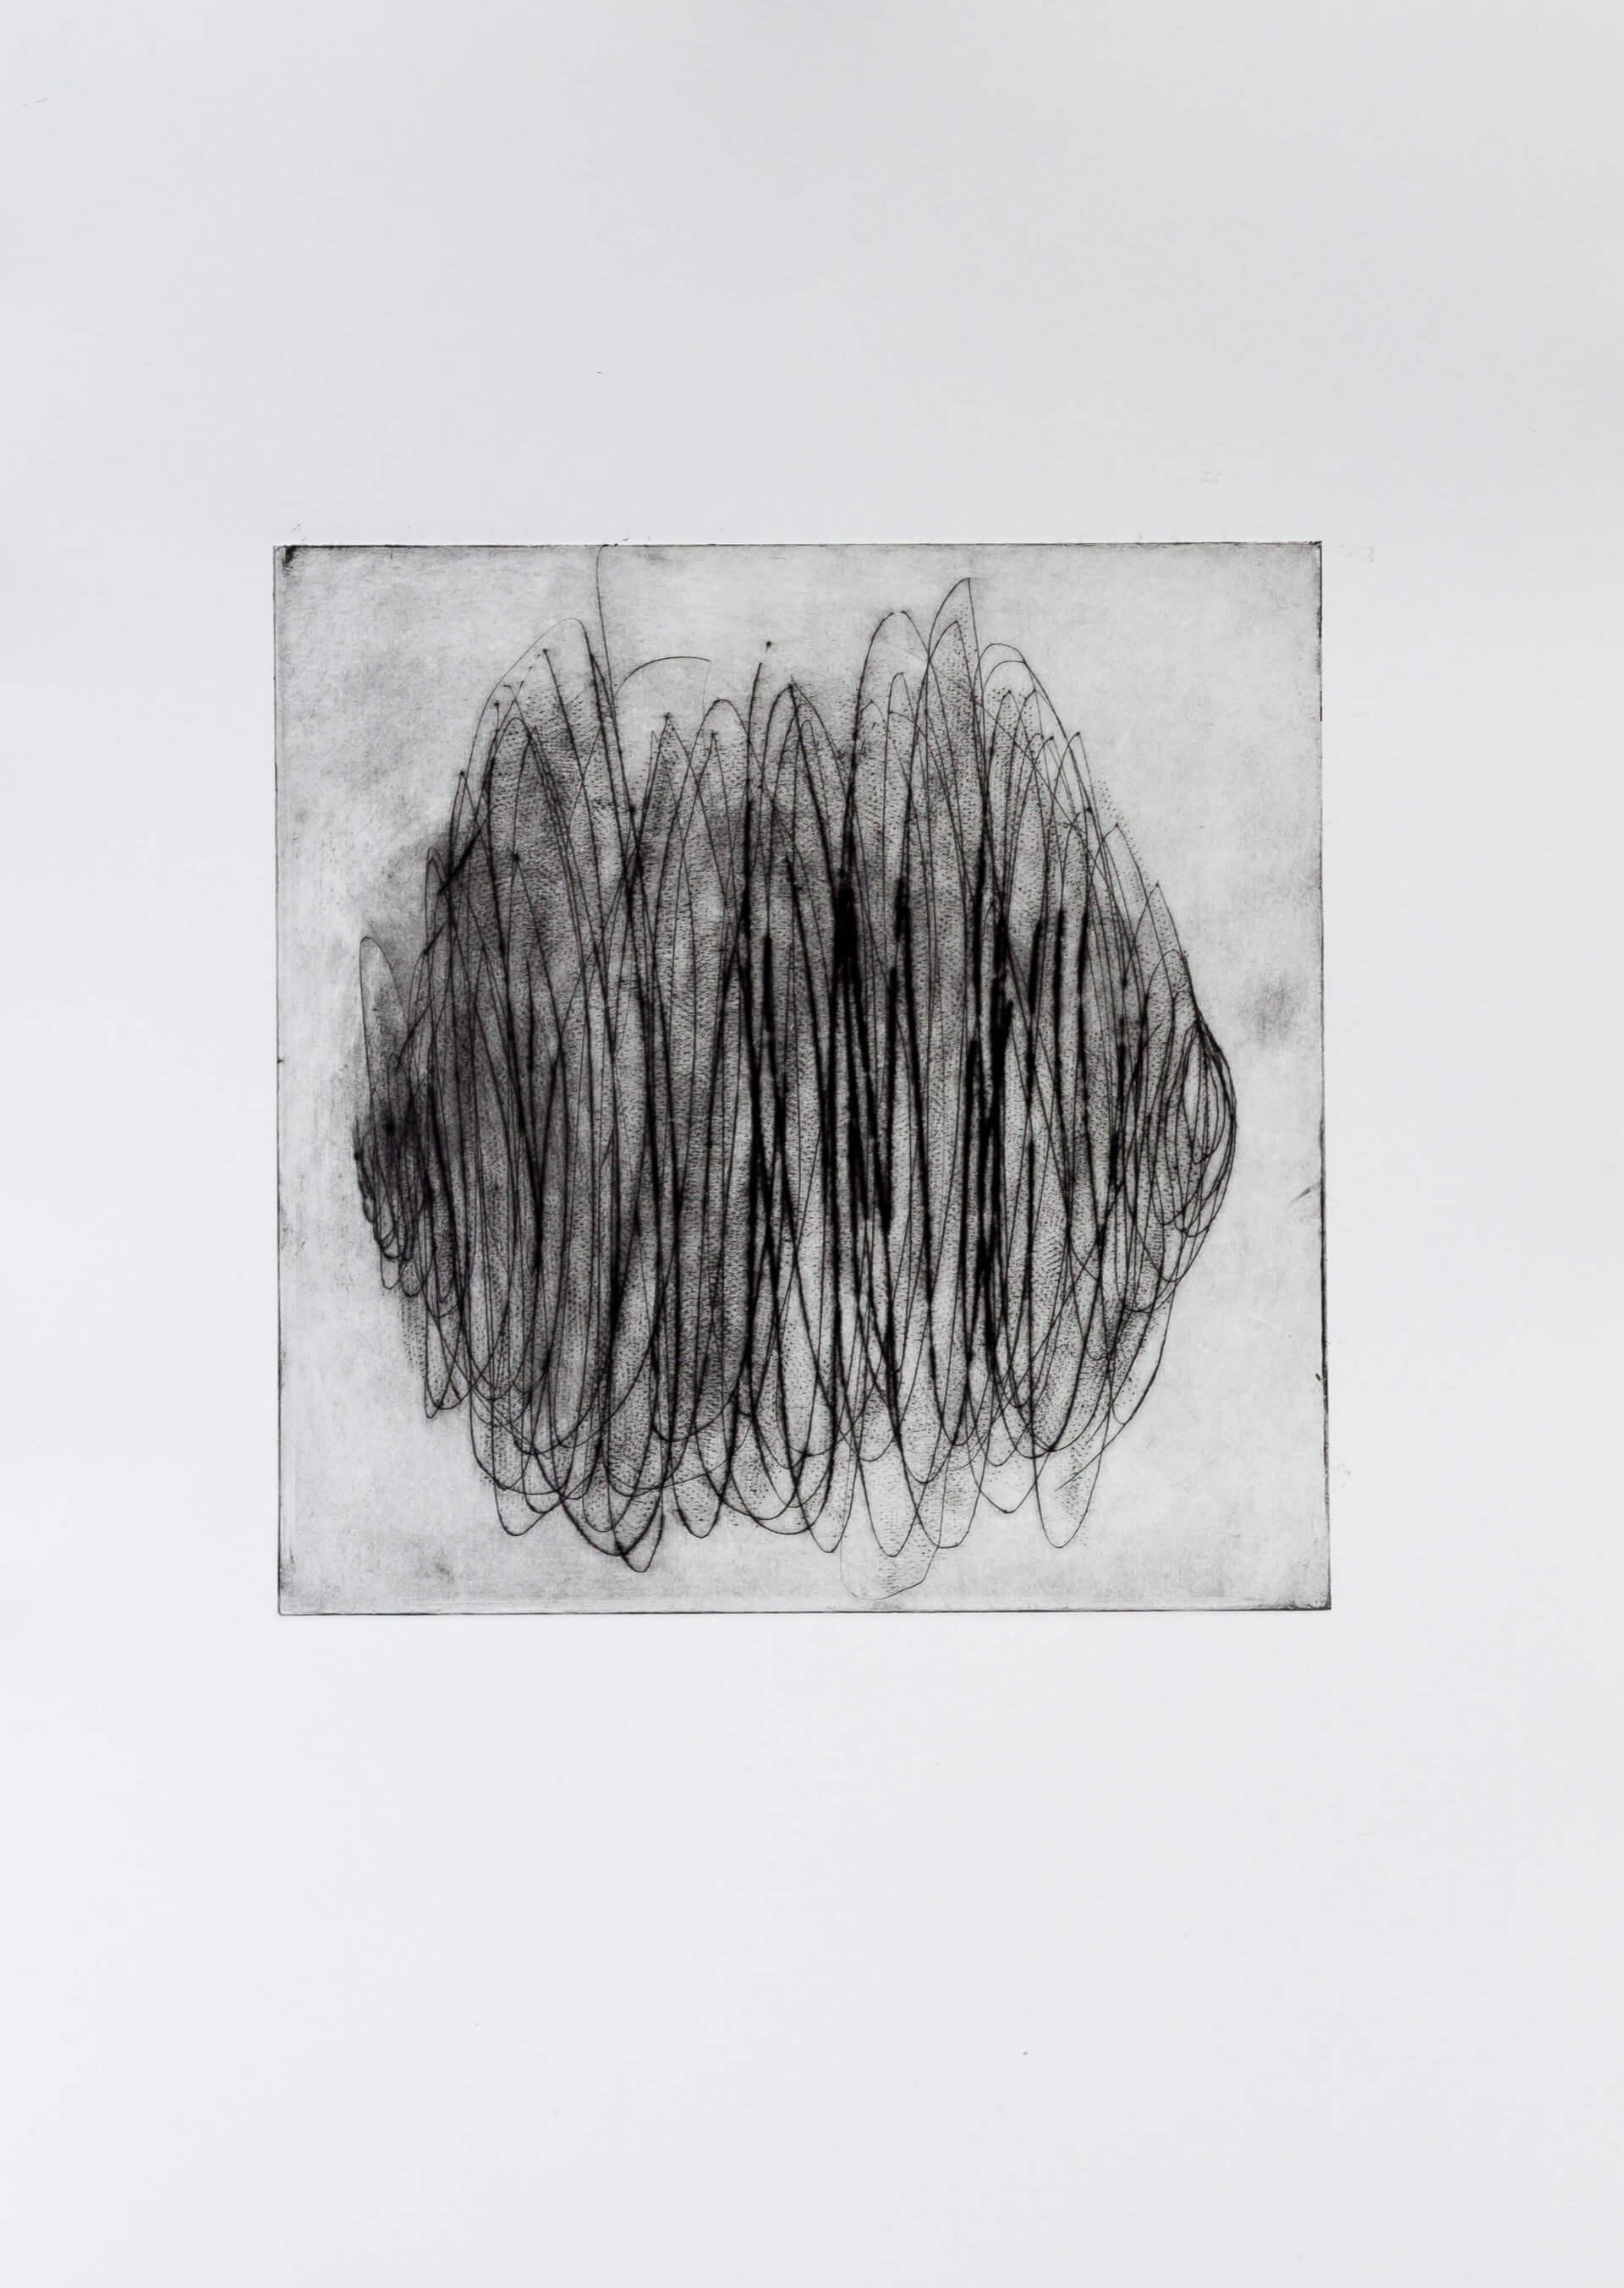 Katharina Albers, Transformation XV, 2011, Radierung, Unikat, 24x23,5cm